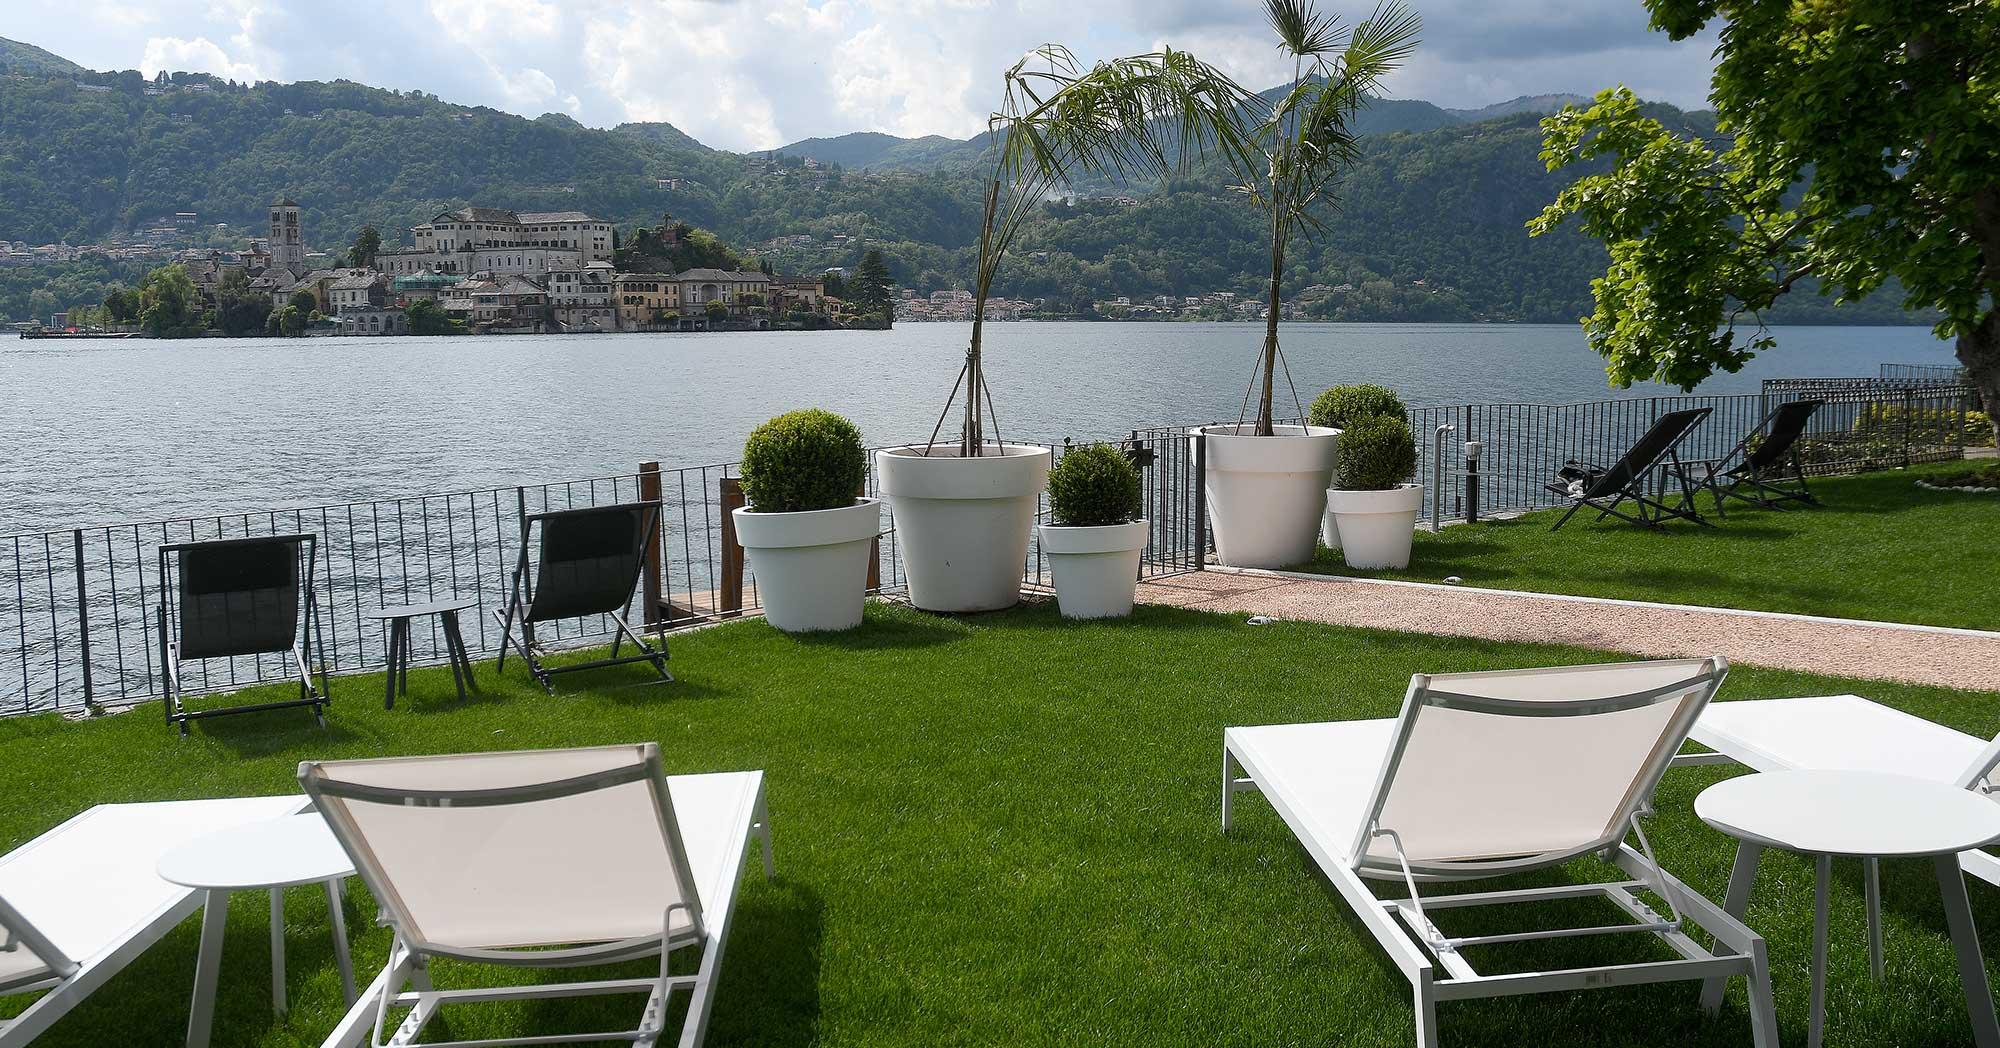 Bifora65_lago d'Orta_Orta_lake_apartments